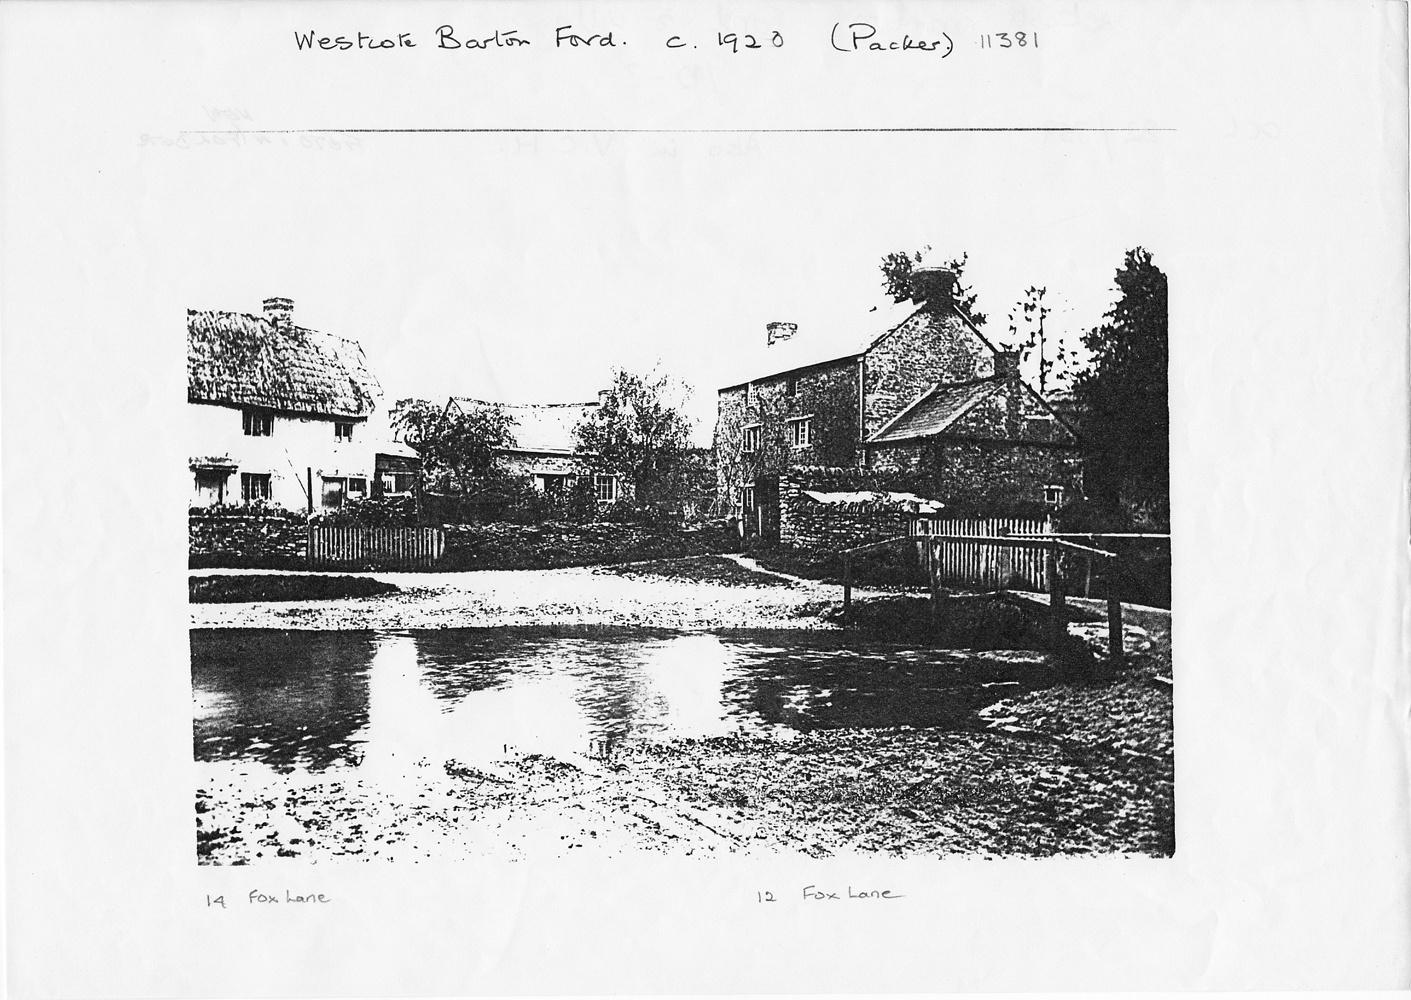 c. 1920 Westcote Barton Ford photocopy.